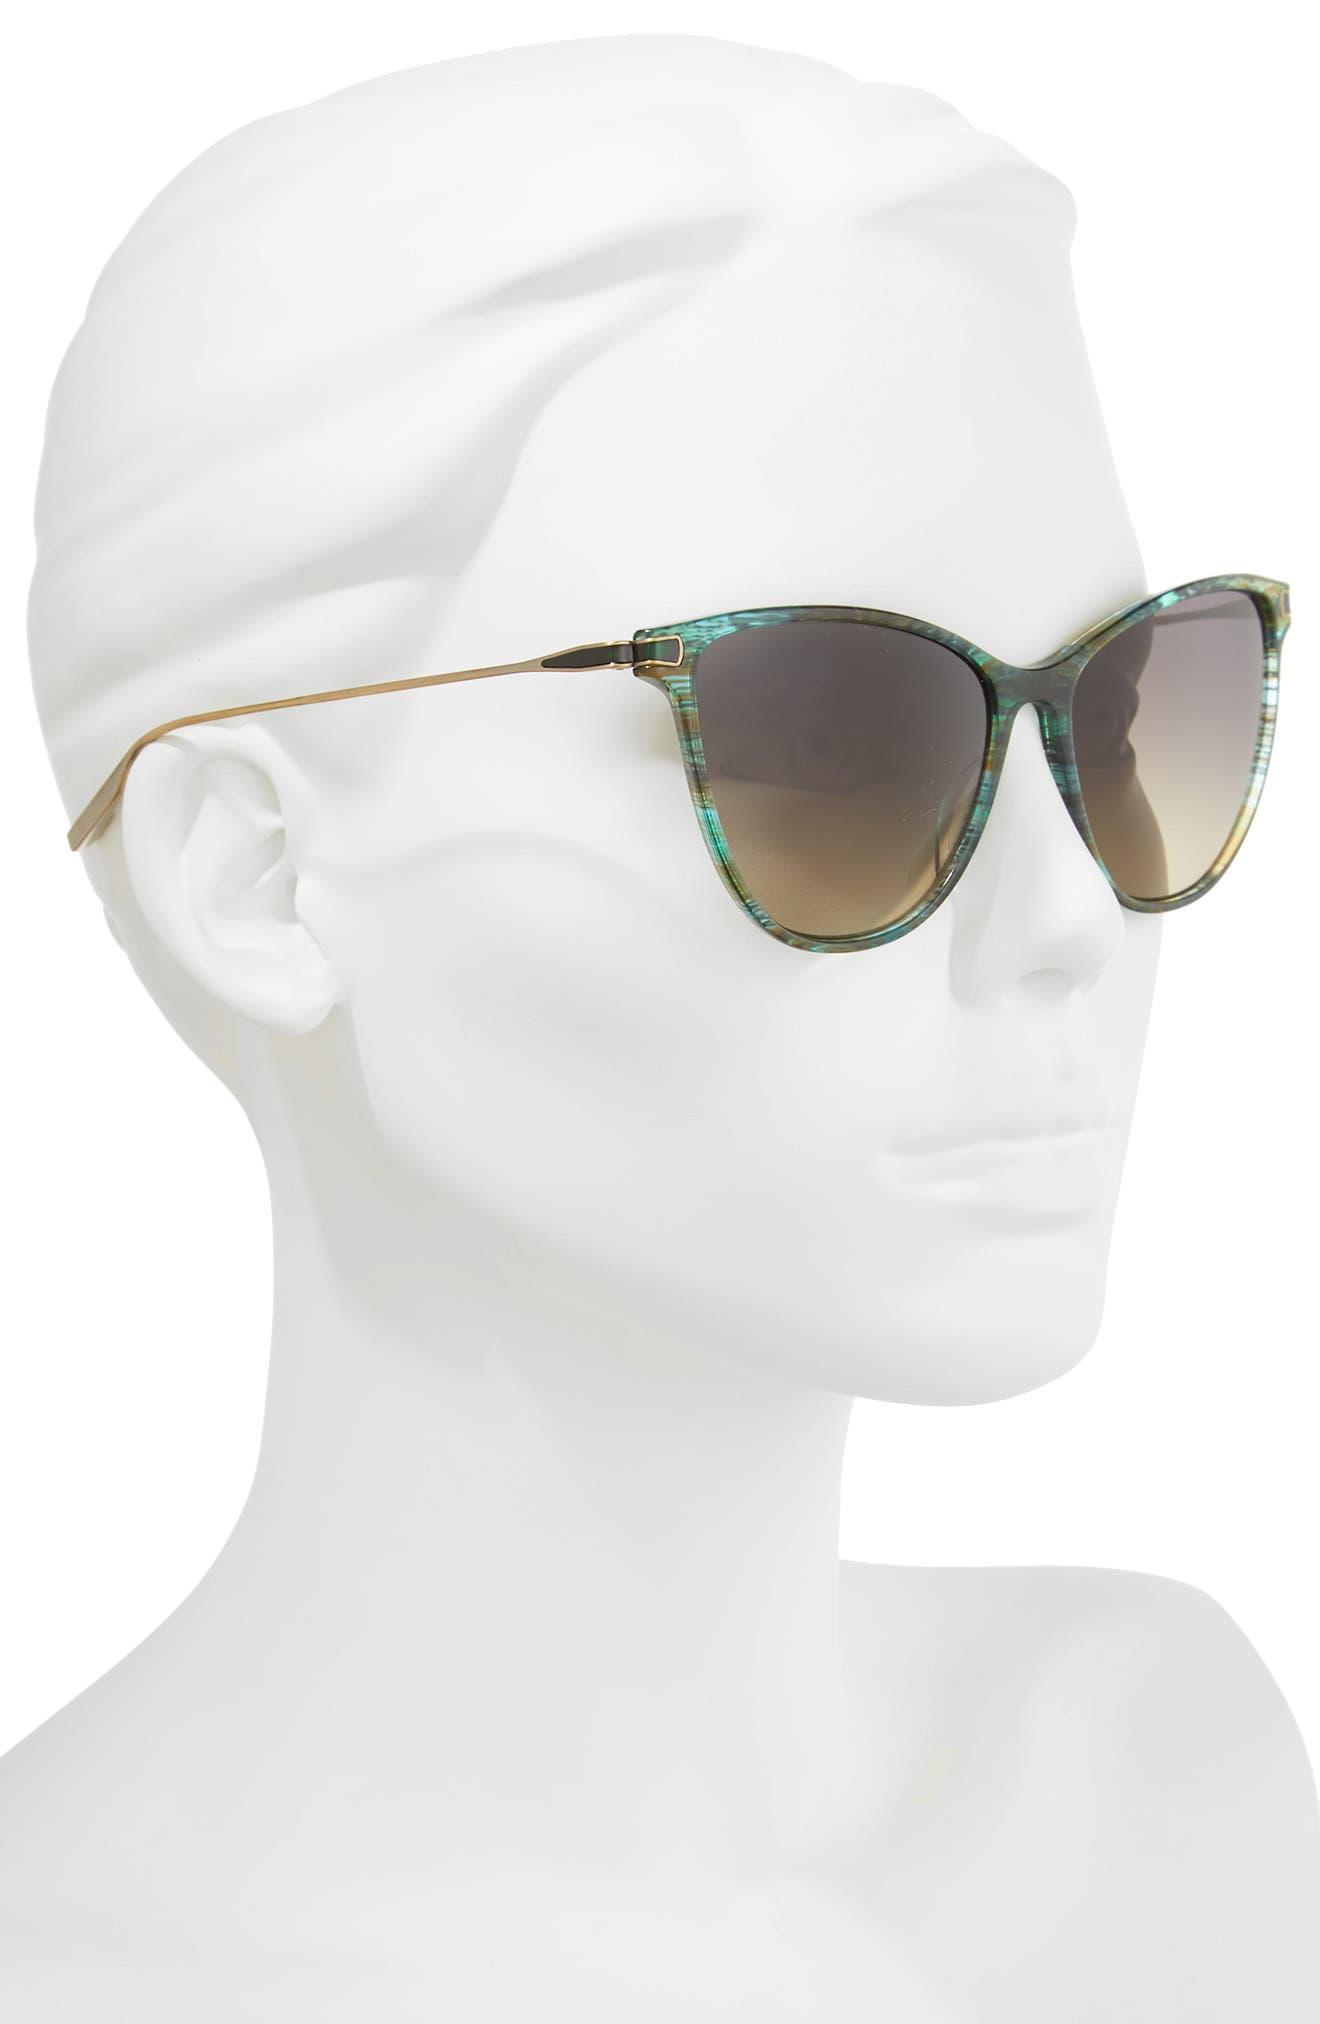 Nia 58mm Polarized Cat Eye Sunglasses,                             Alternate thumbnail 2, color,                             Sandy Sea Green